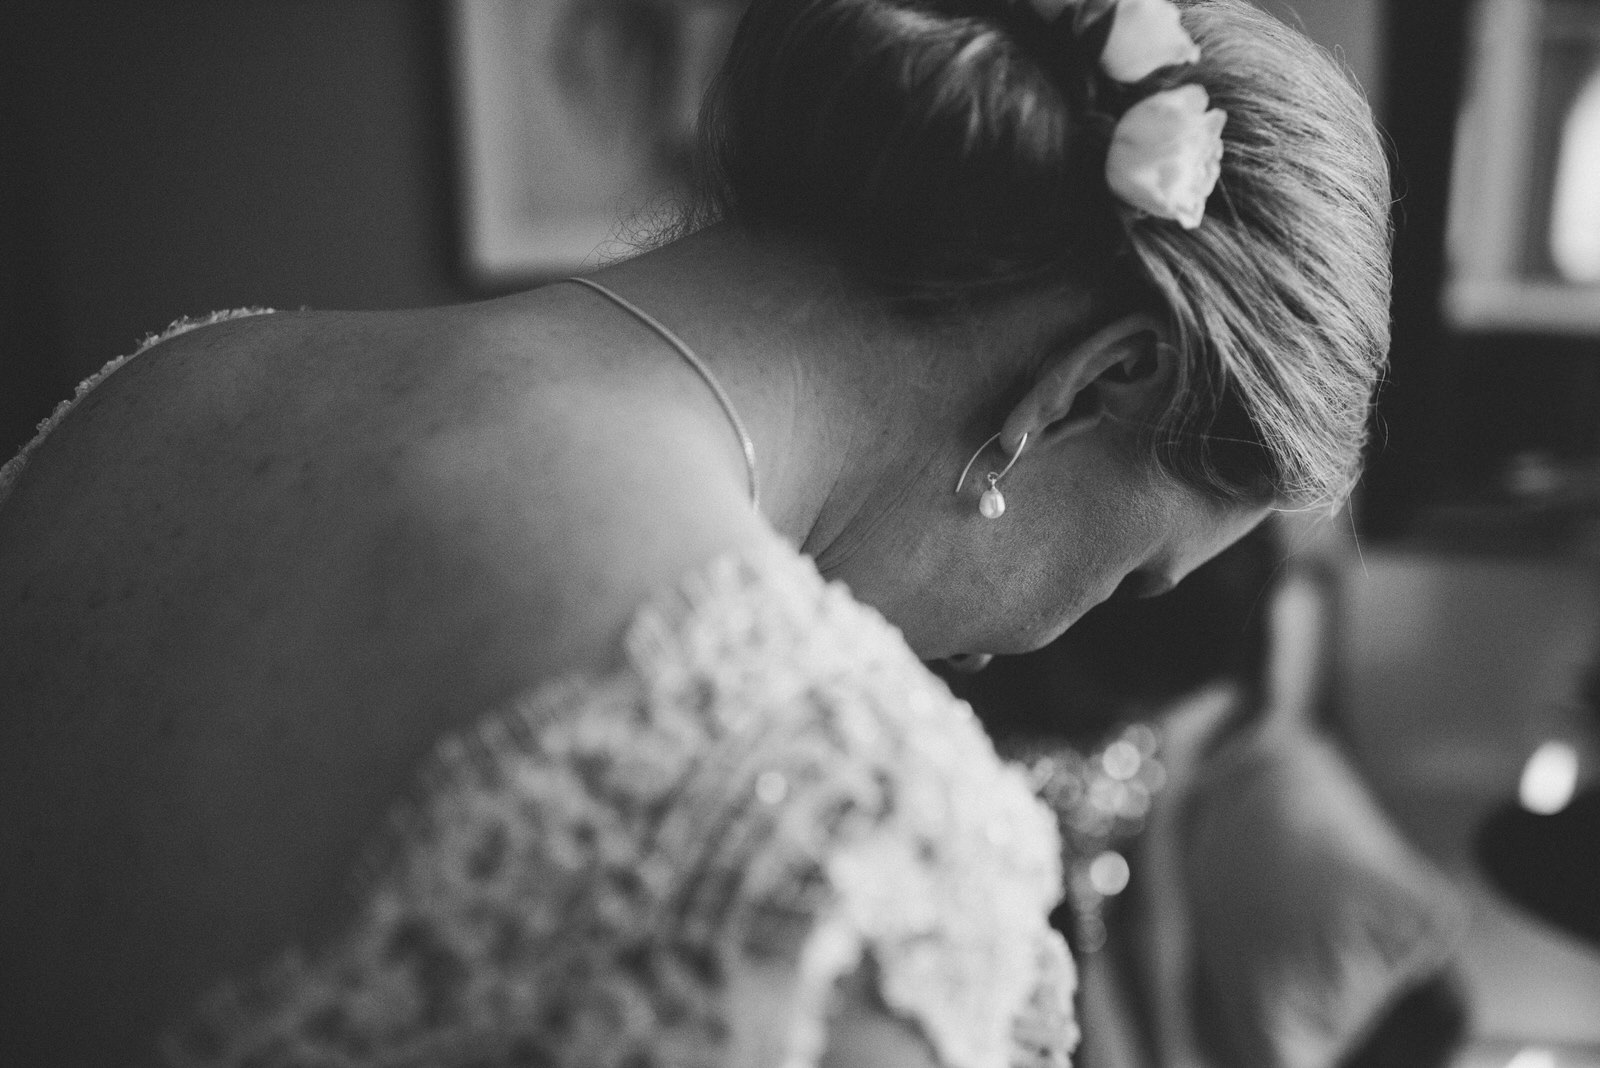 008-LOURMARIN-WEDDING-PHOTOGRAPHER-PROVENCE-WEDDING-ALTERNATIVE-WEDDING-PHOTOGRAPHY-FRANCE-PROVENCE-GARDEN-WEDDING.JPG